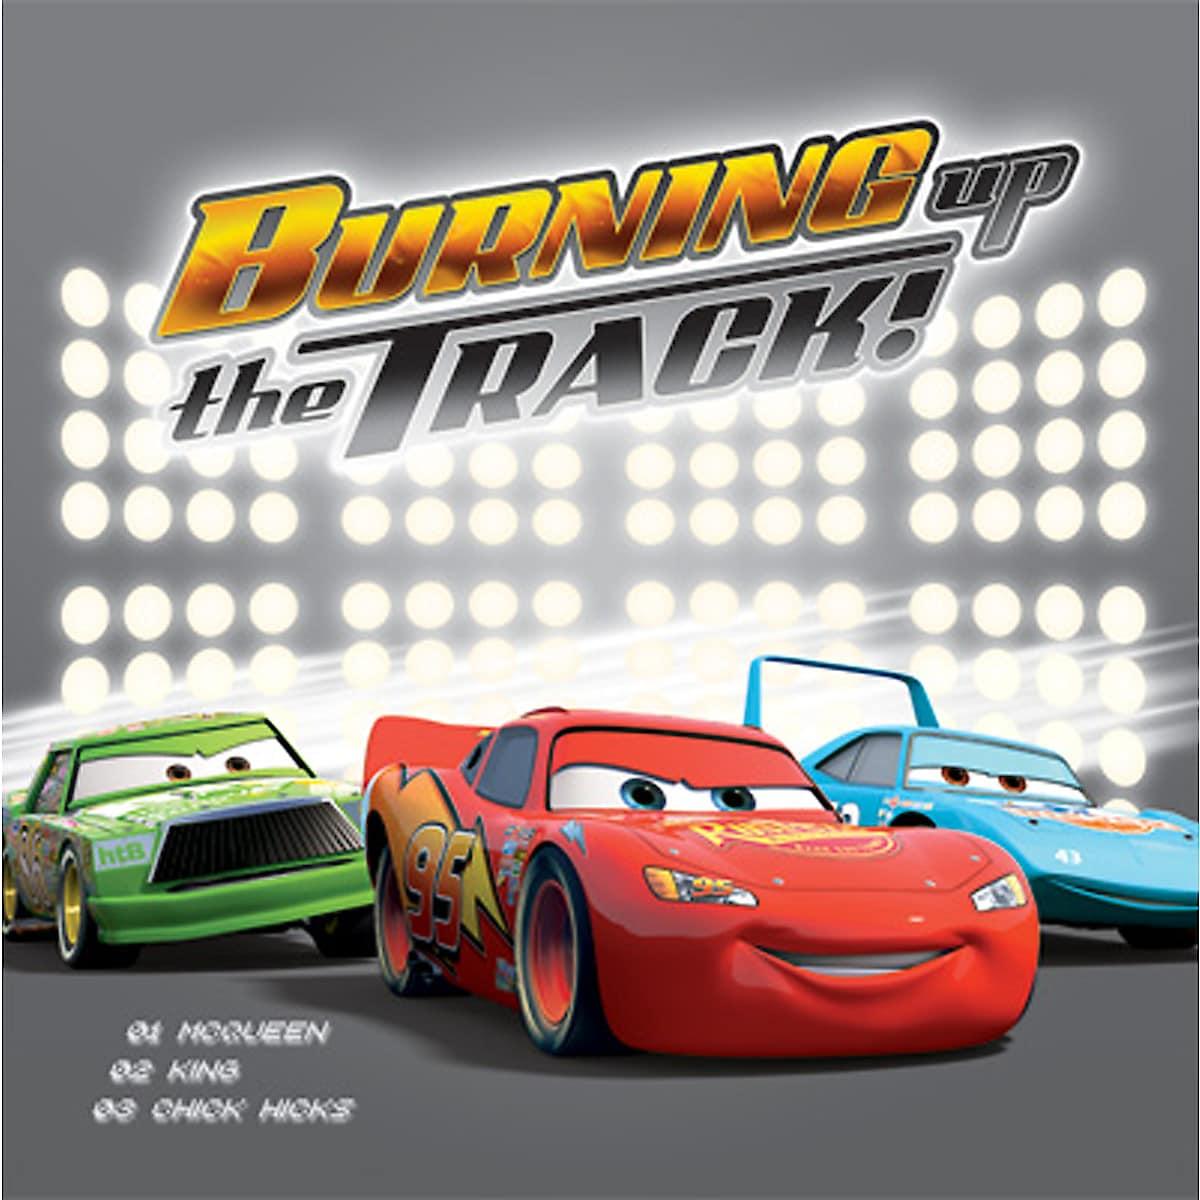 Bilder med Disney Cars-motiv